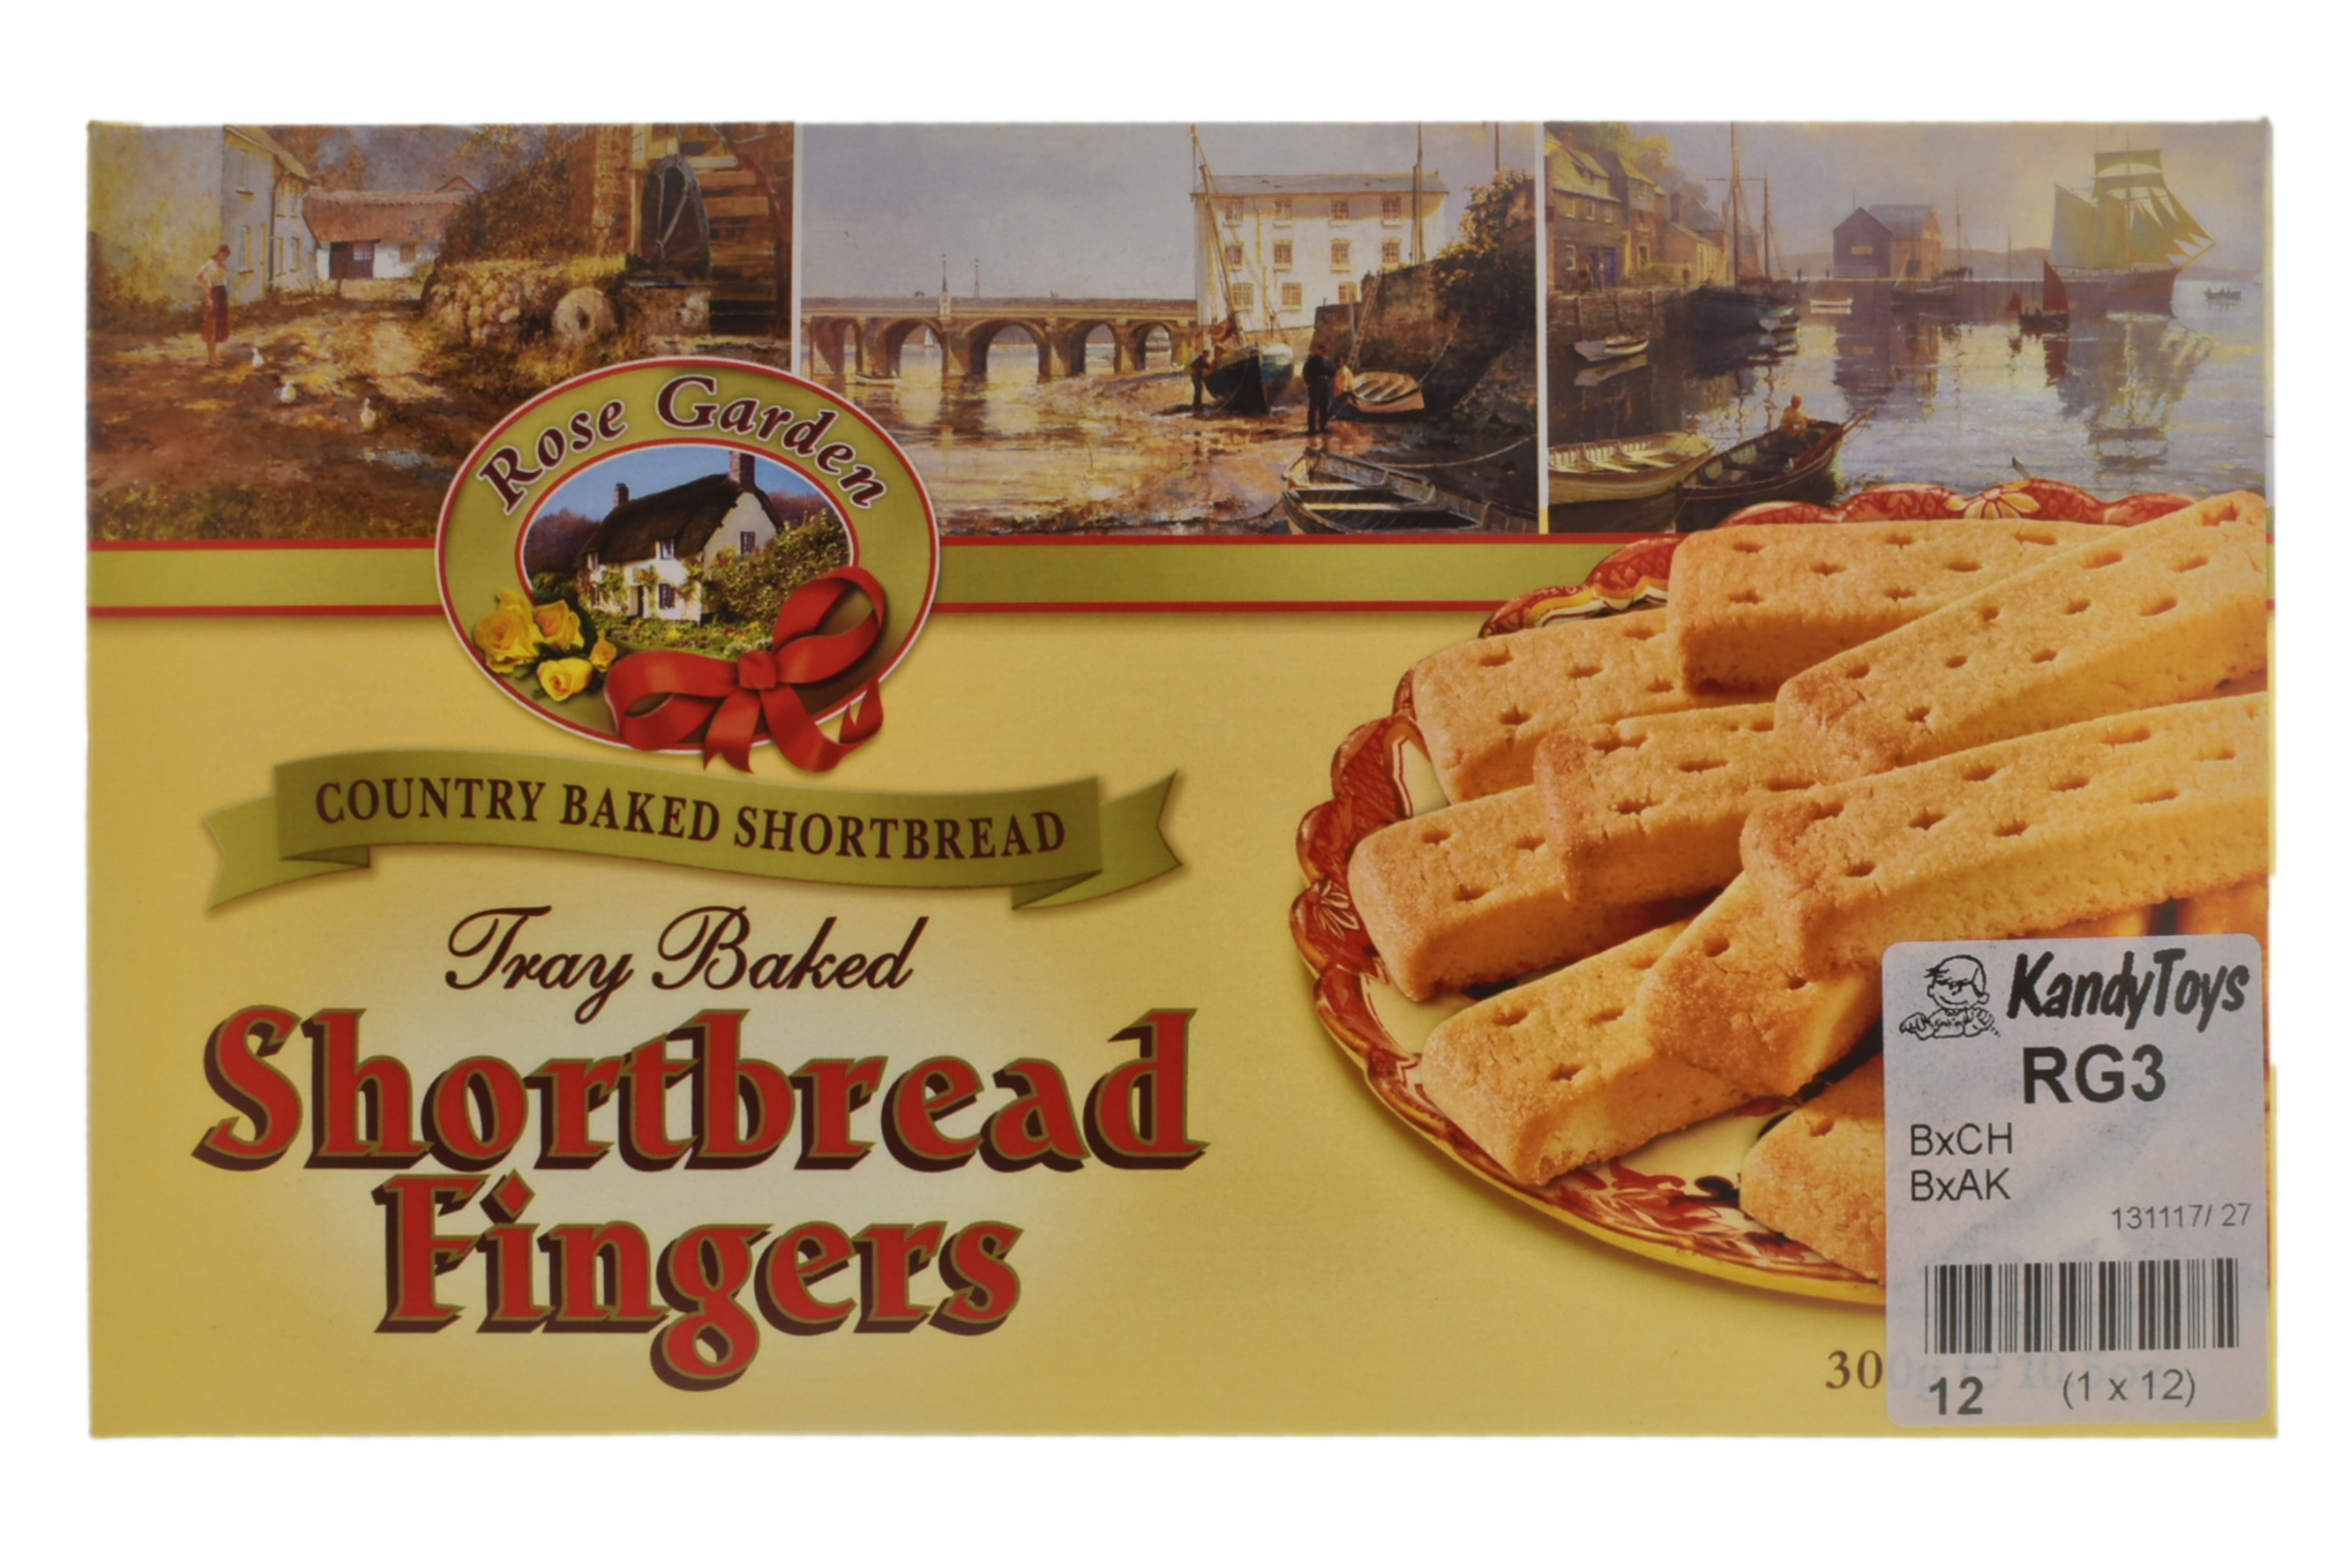 300g Clotted Cream Shortbread Fingers (Rose Garden)